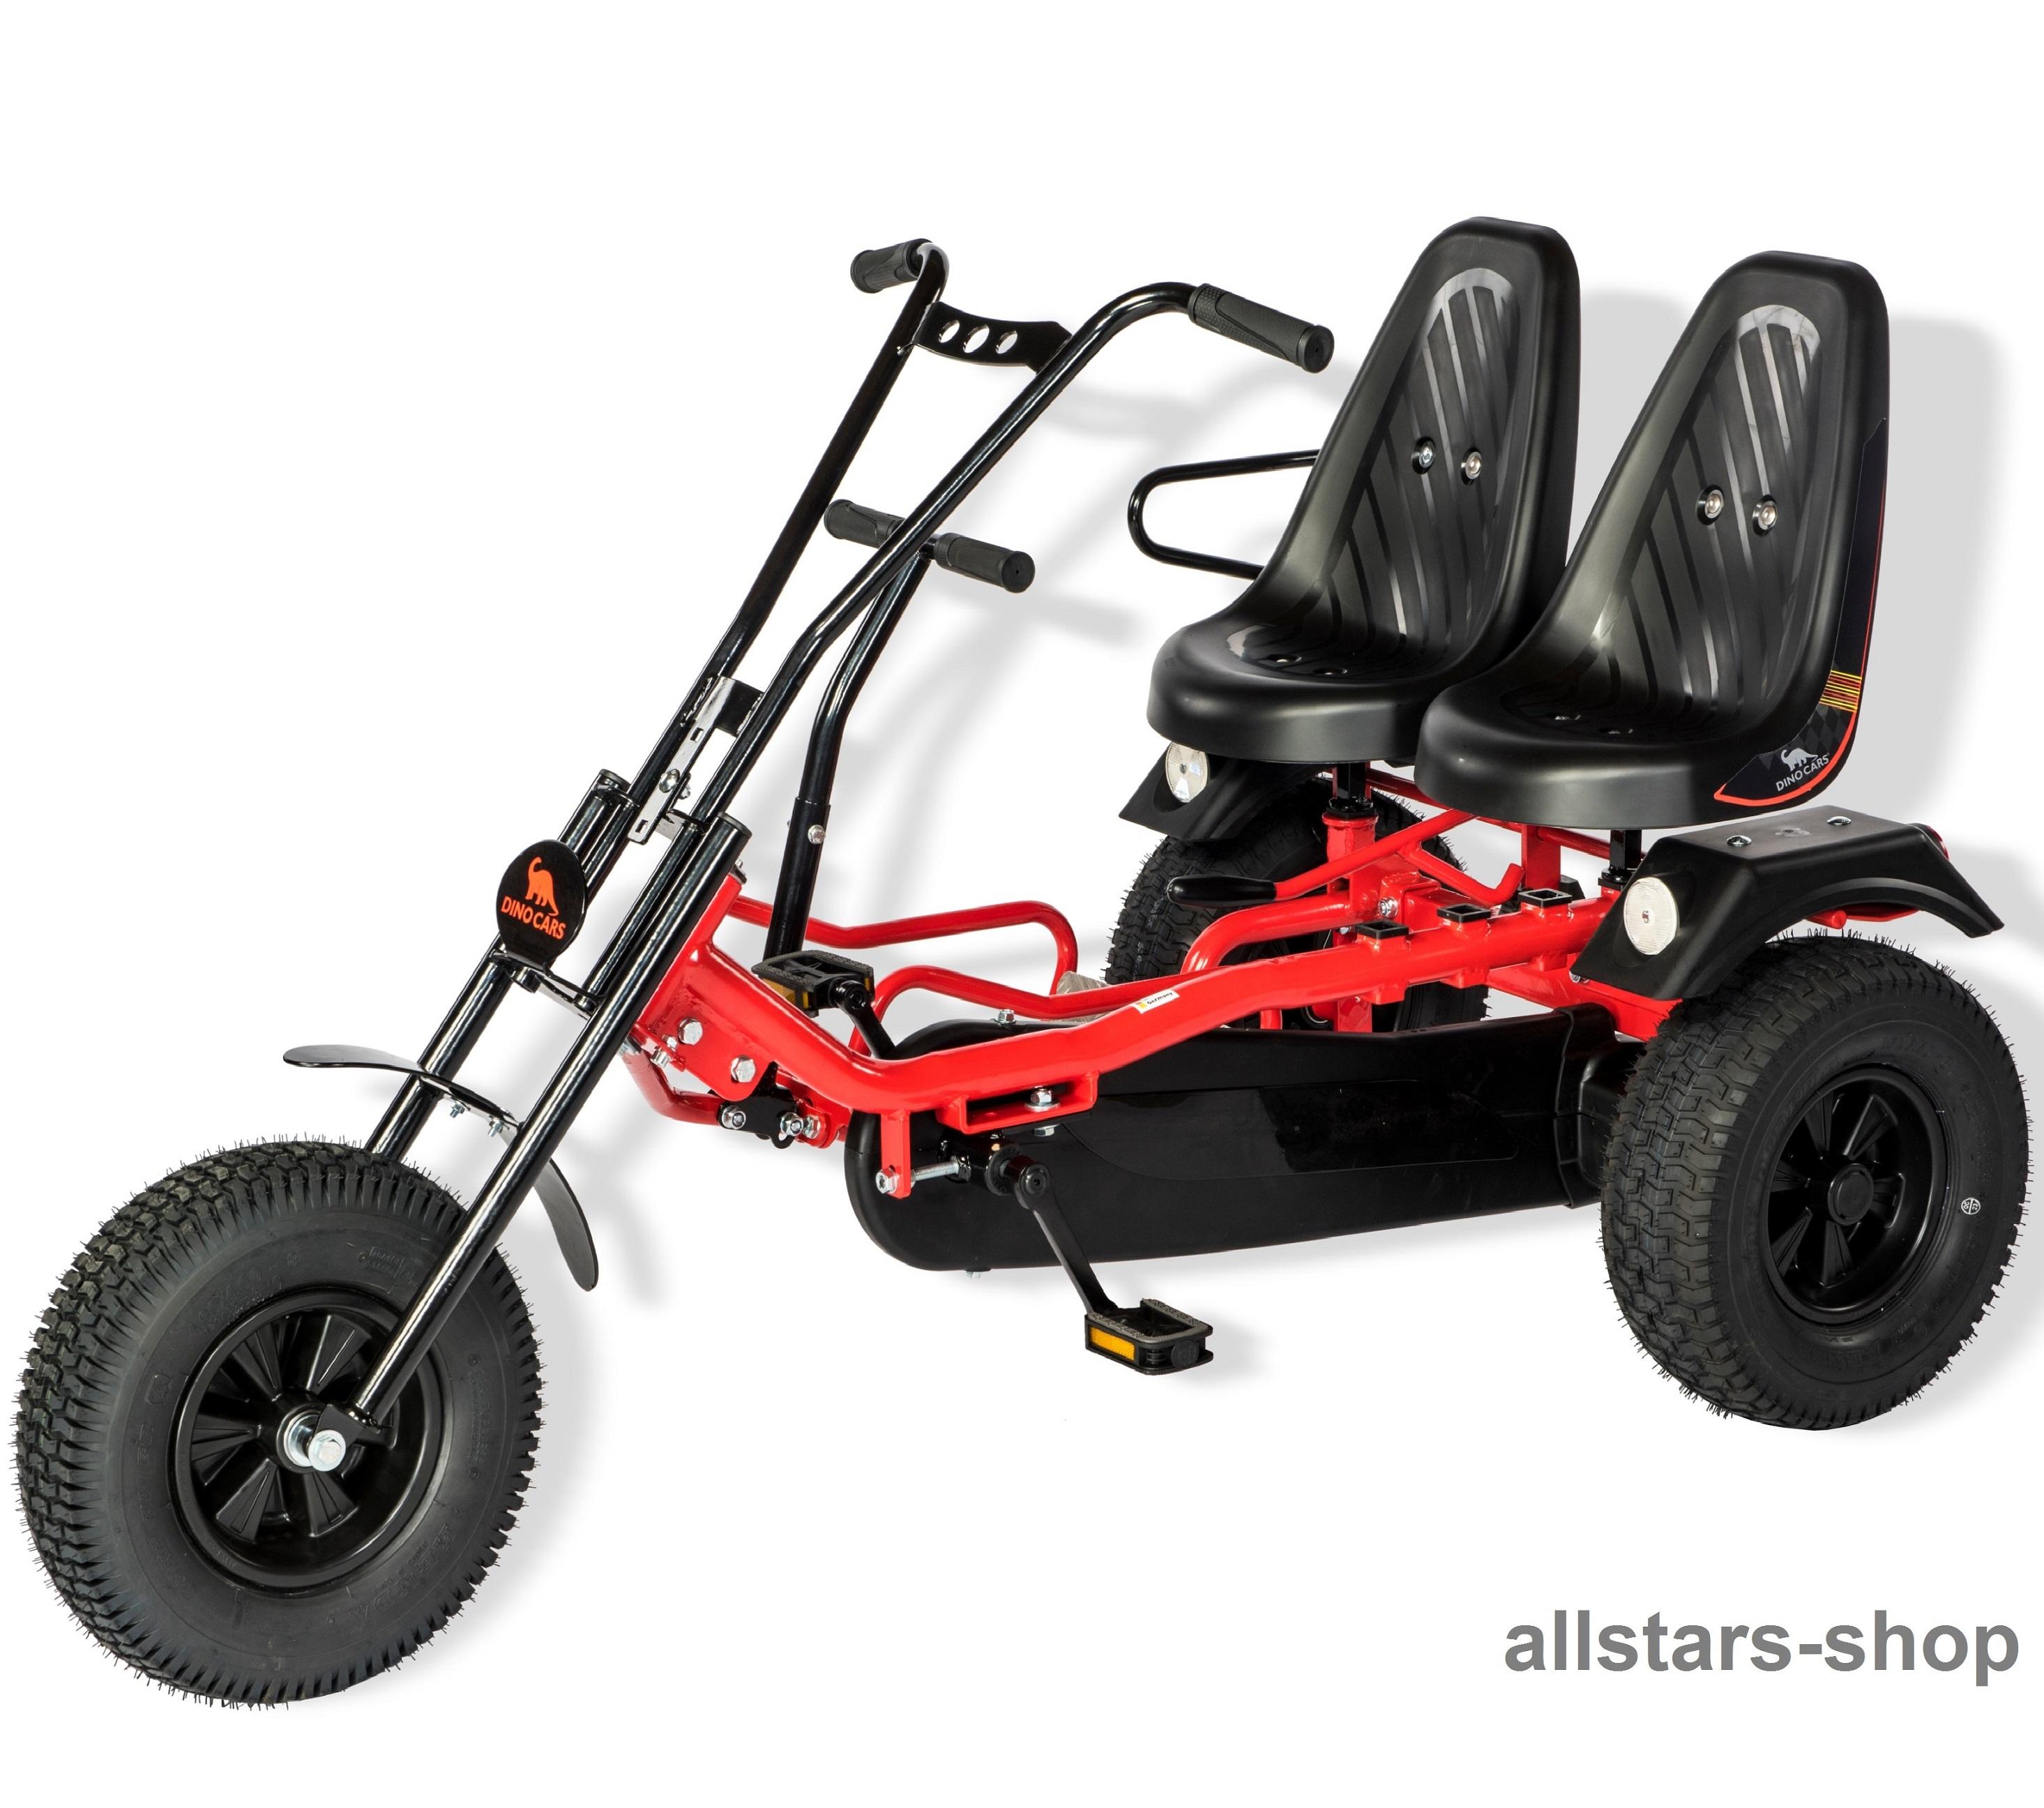 dino cars 2 rider doppelsitzer dreiradwagen gocart 2 sitze. Black Bedroom Furniture Sets. Home Design Ideas